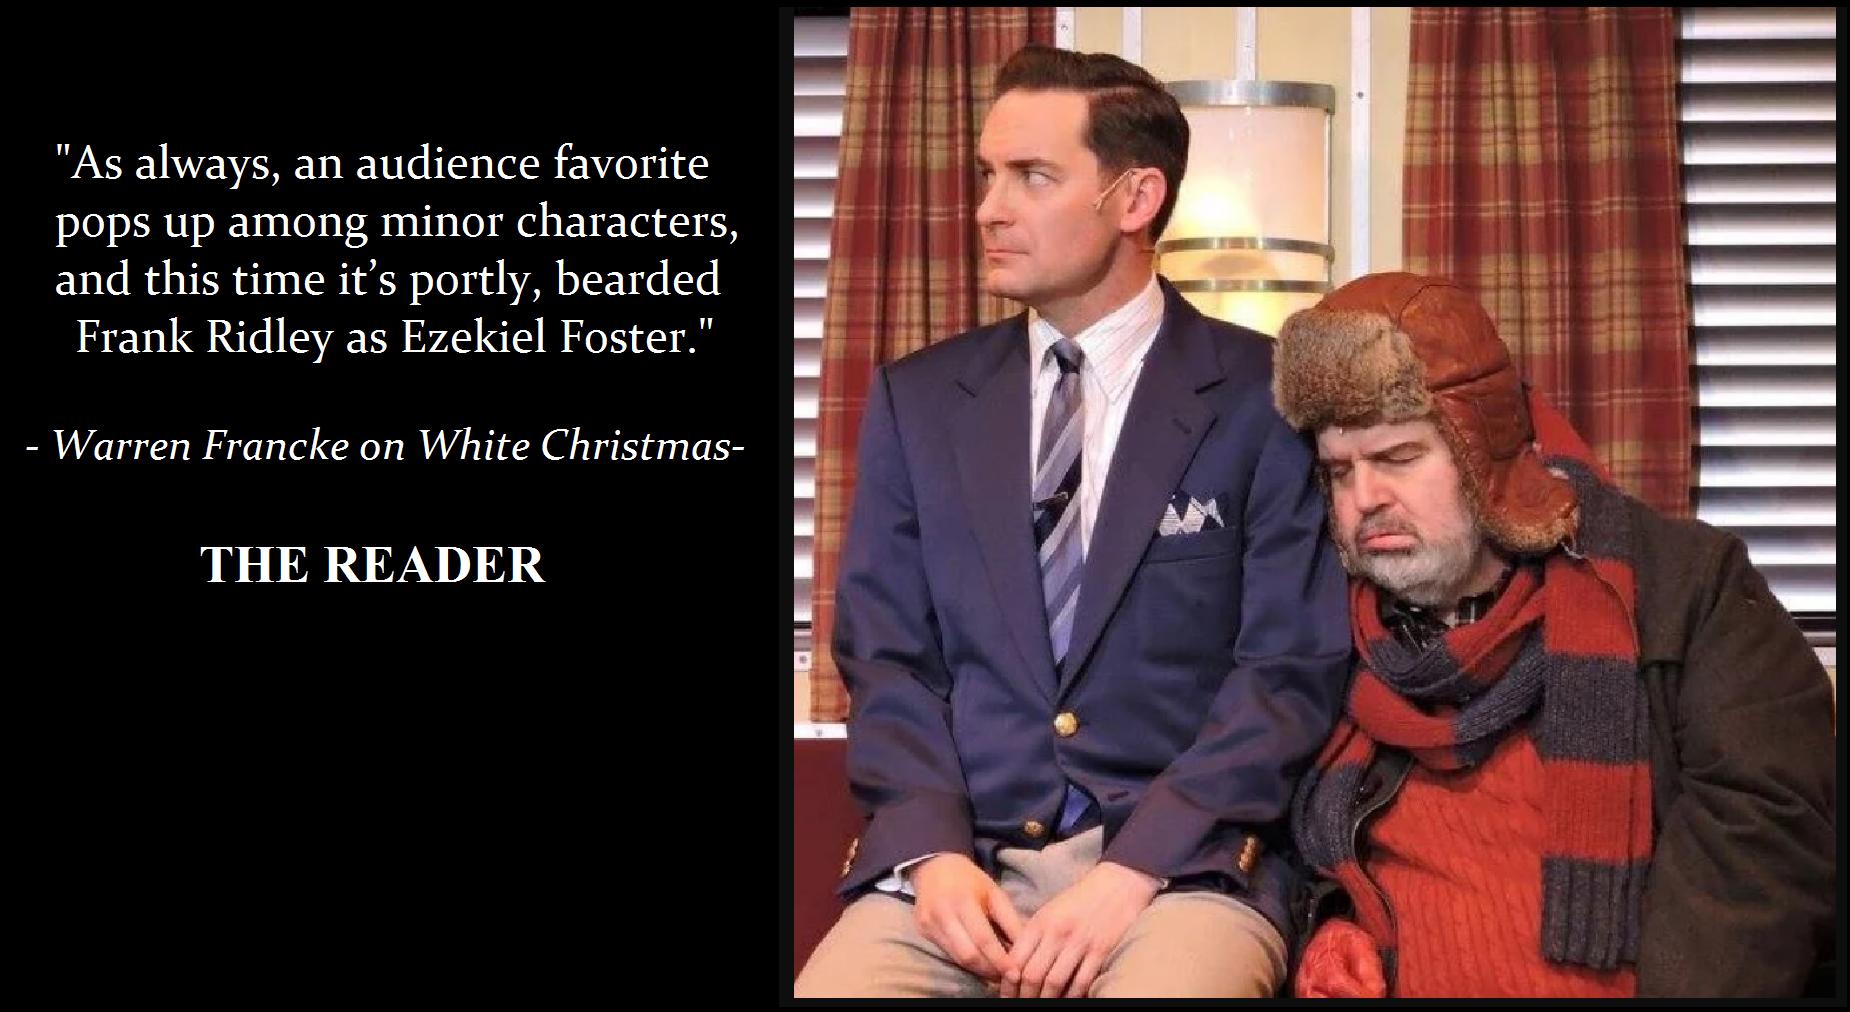 Frank Ridley as Ezekiel Foster in Irving Berlin's White Christmas